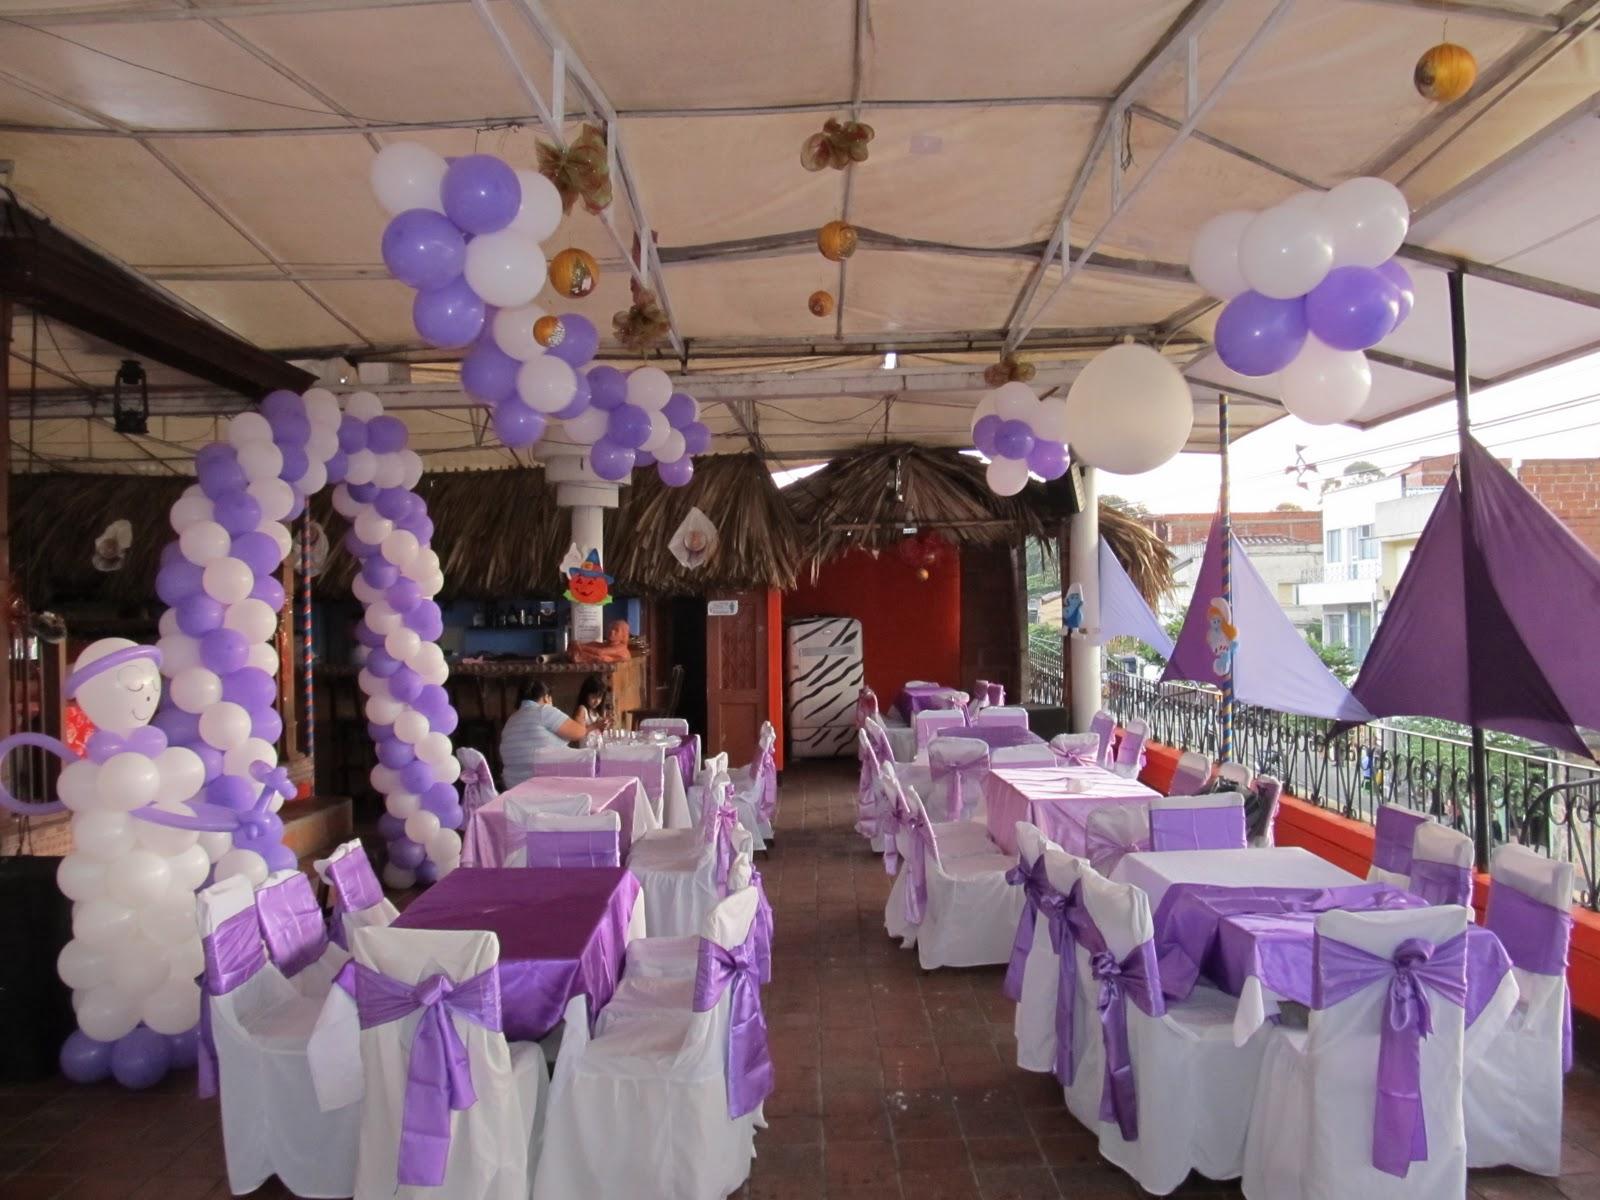 Decoracion con globos para primera comunion y for Adornos para mesas de salon